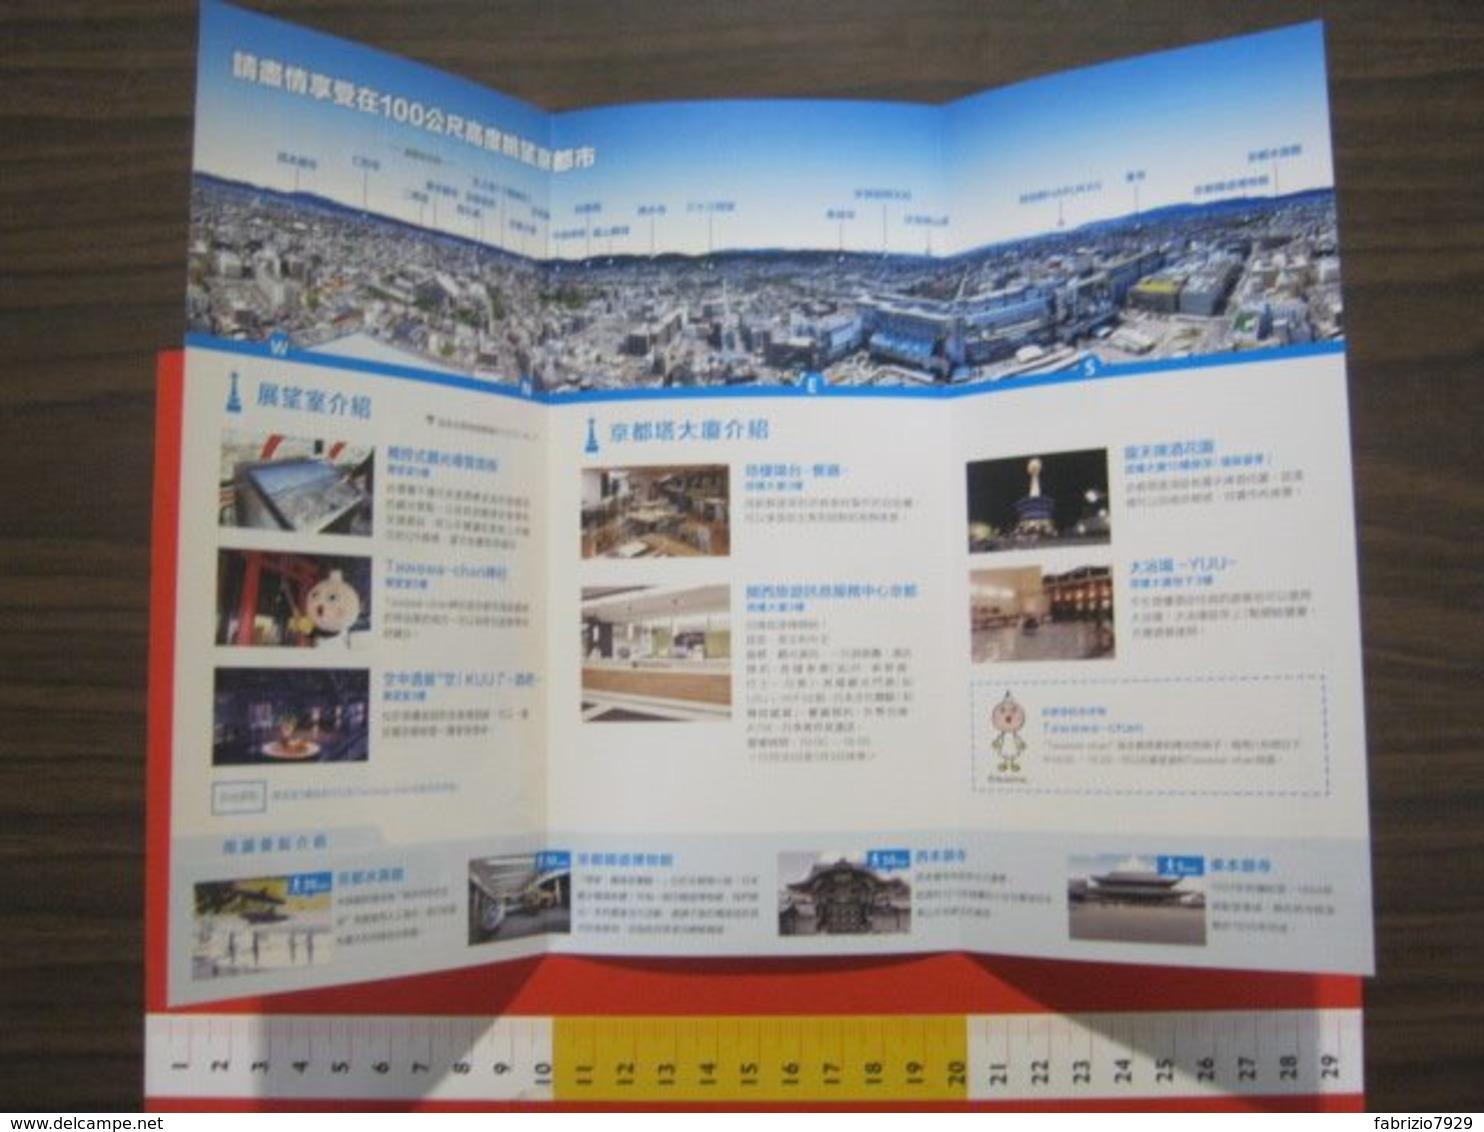 Z.08 JAPAN GIAPPONE DEPLIANT TURISMO 2019 - KYOTO TOWER + STAMP CACHET TIMBRO - JAPANESE LANGUAGE - Dépliants Turistici